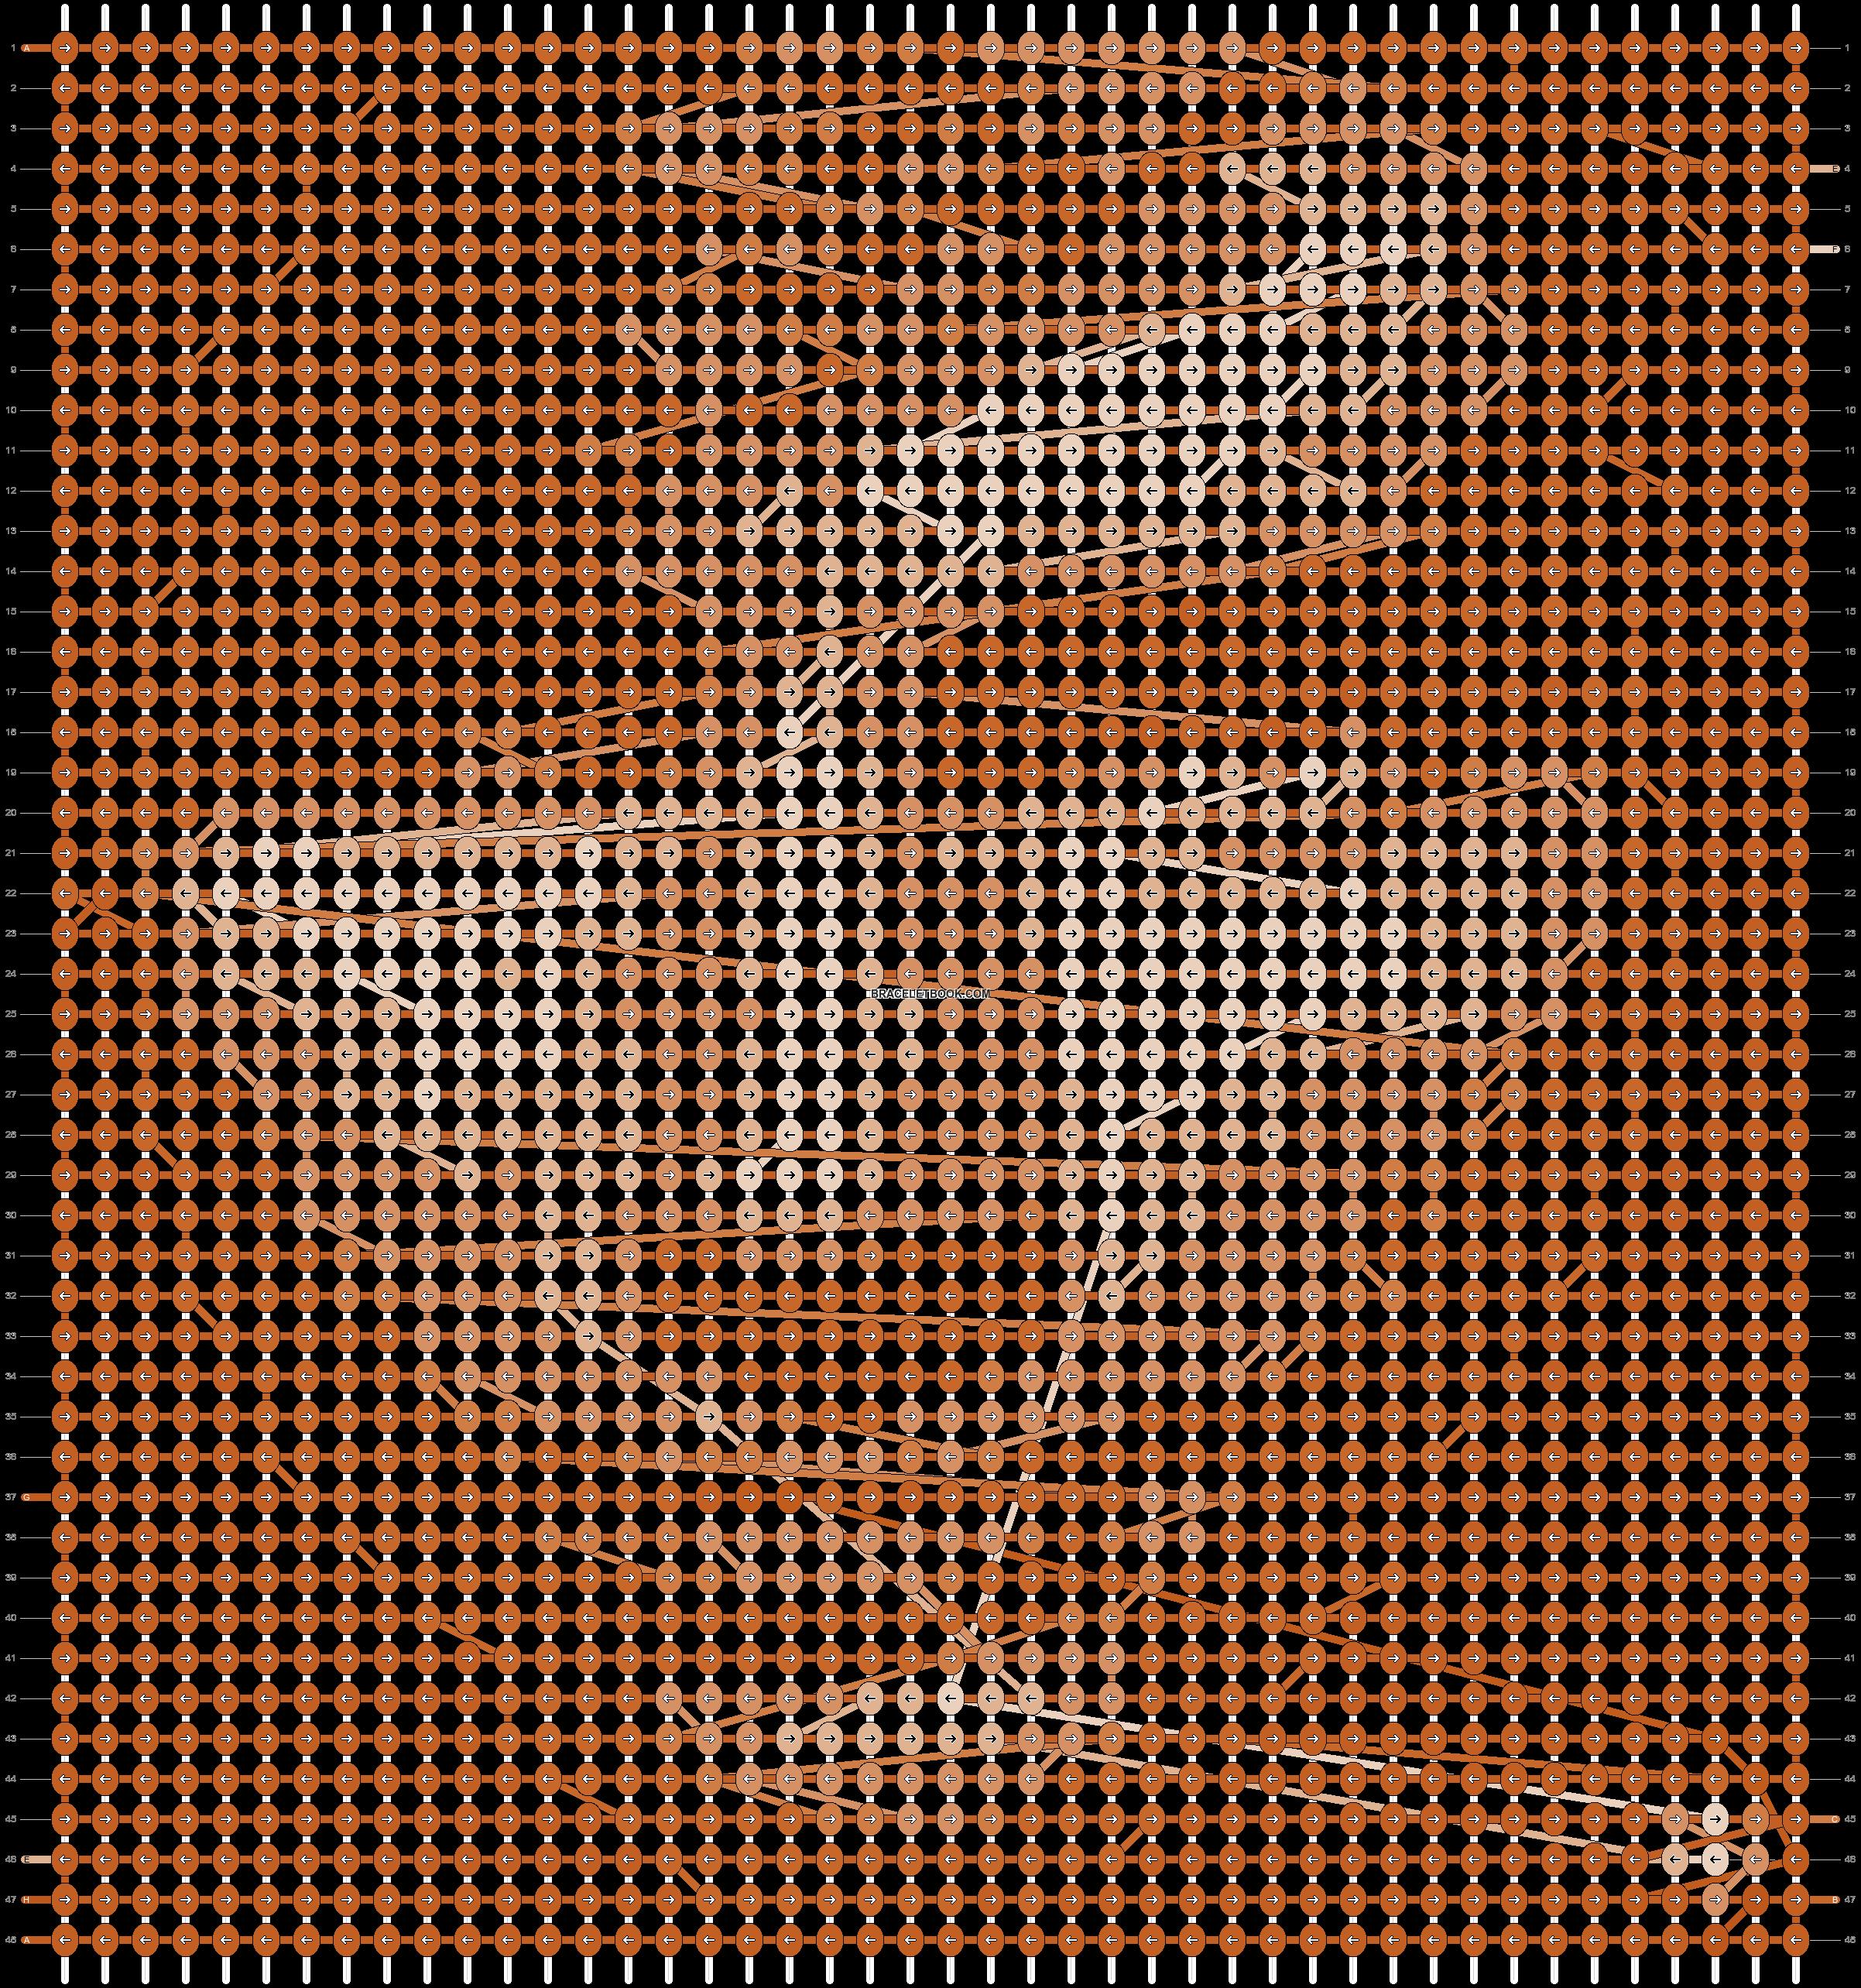 Alpha Pattern #19469 added by diyfairy